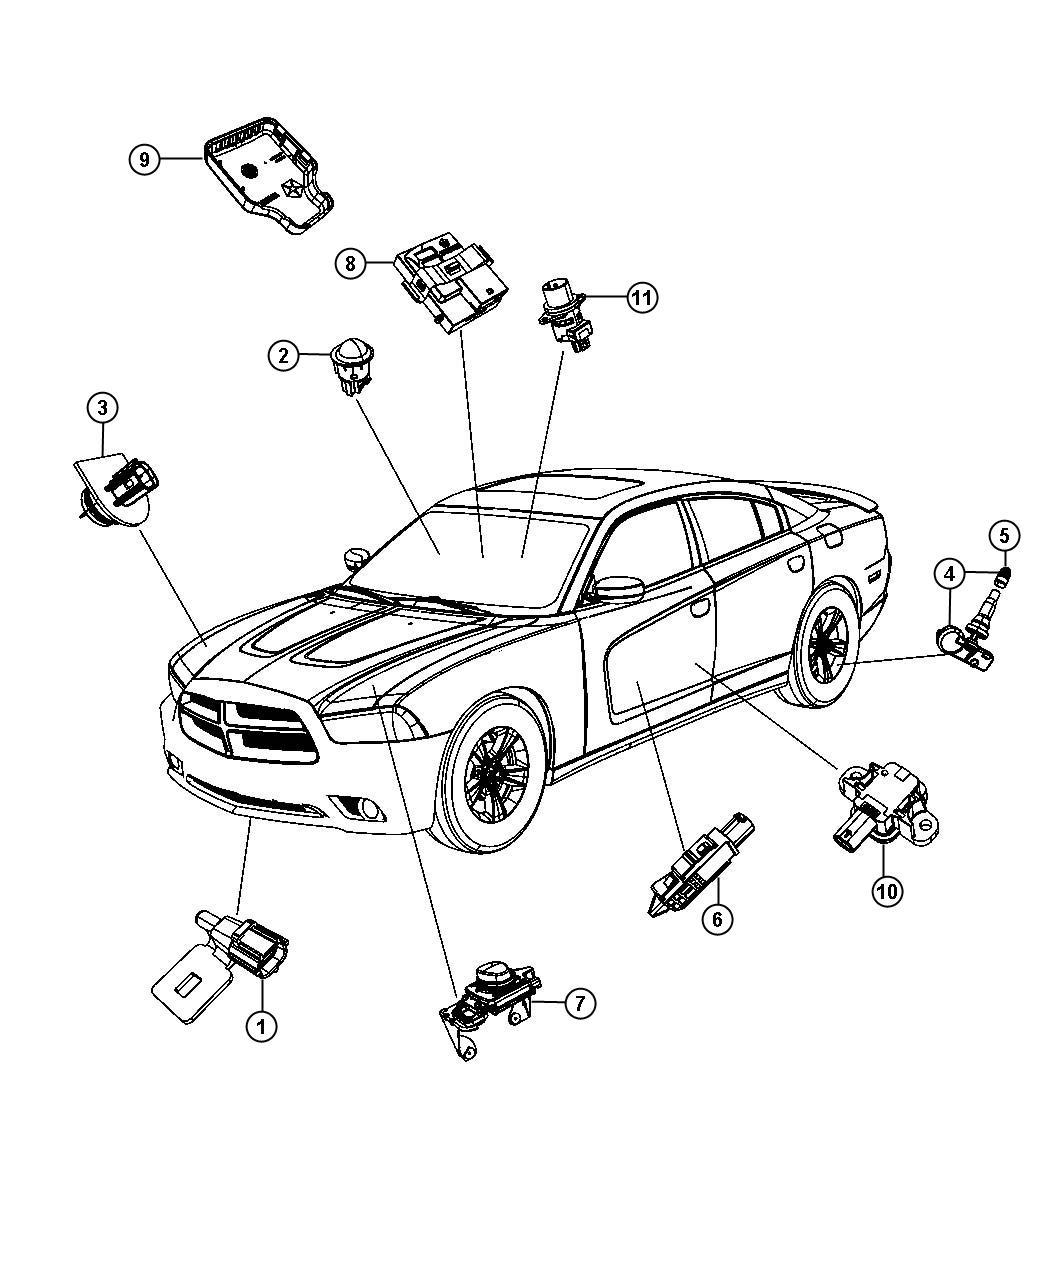 2013 Dodge Sensor and bracket. Adaptive speed control